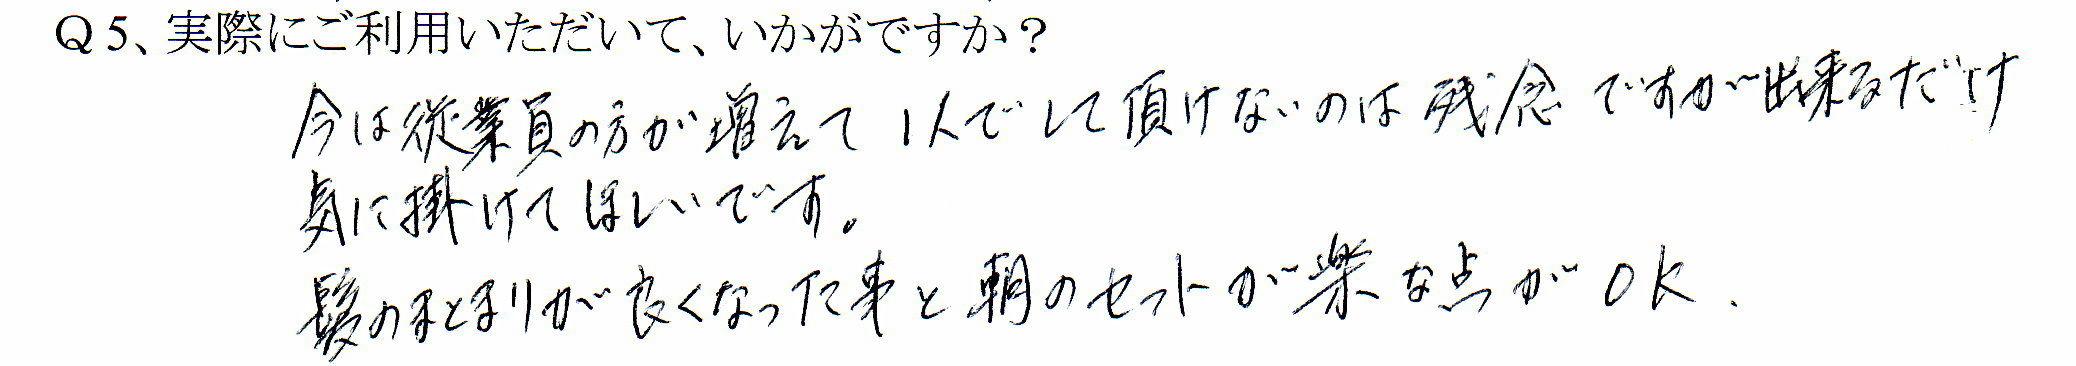 14HN様Q5